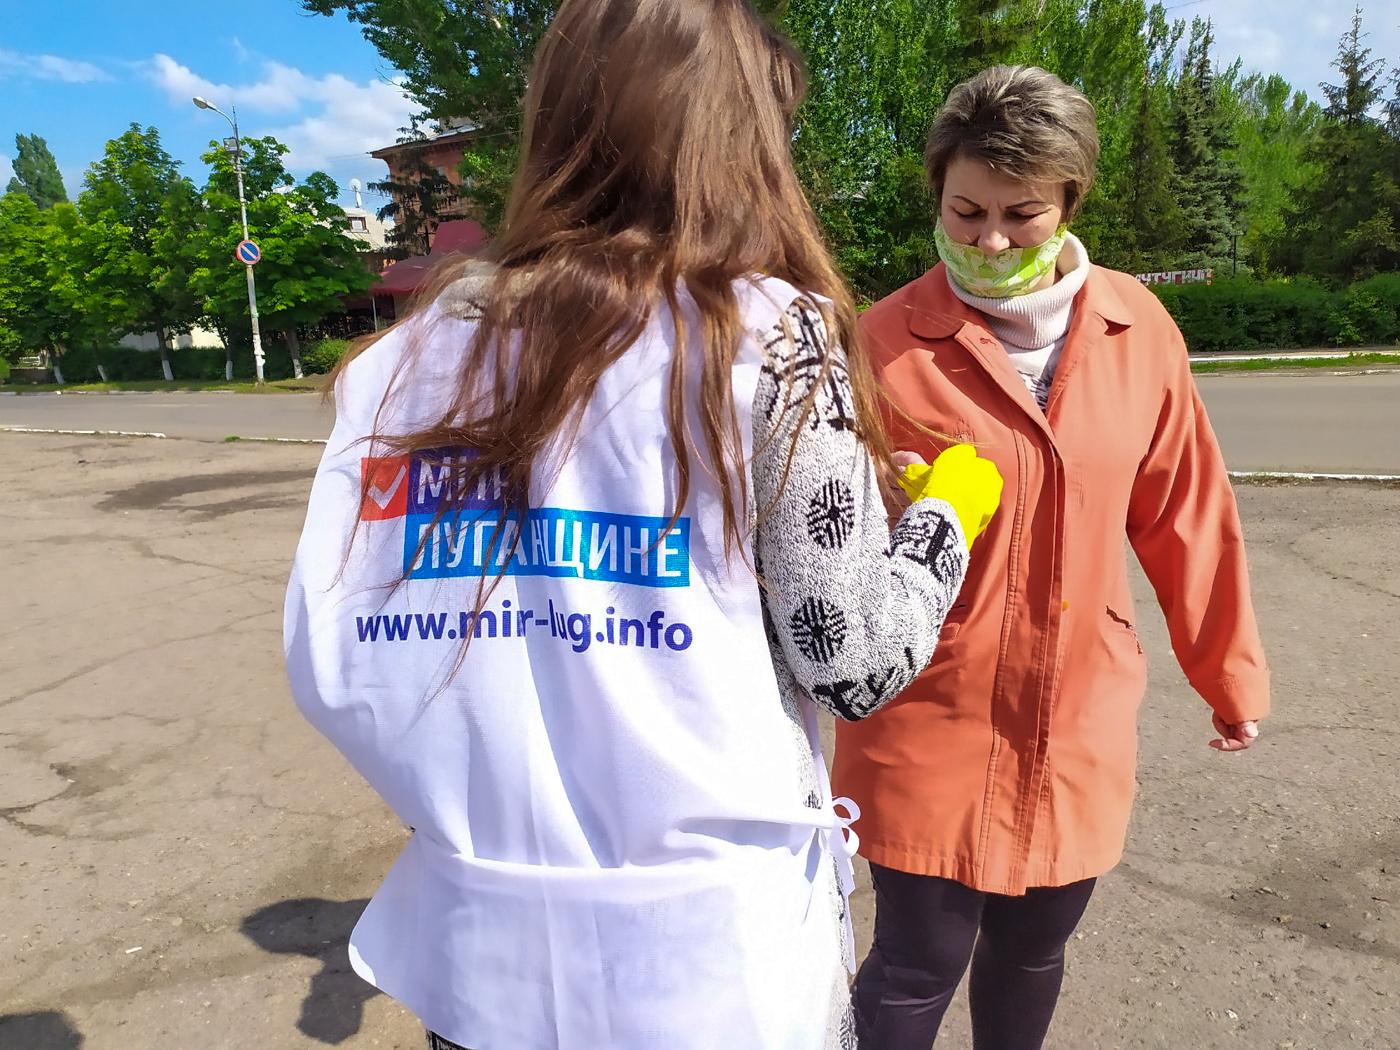 Жителям Лутугино рассказали об акции «Стоп наркотикам!» 2